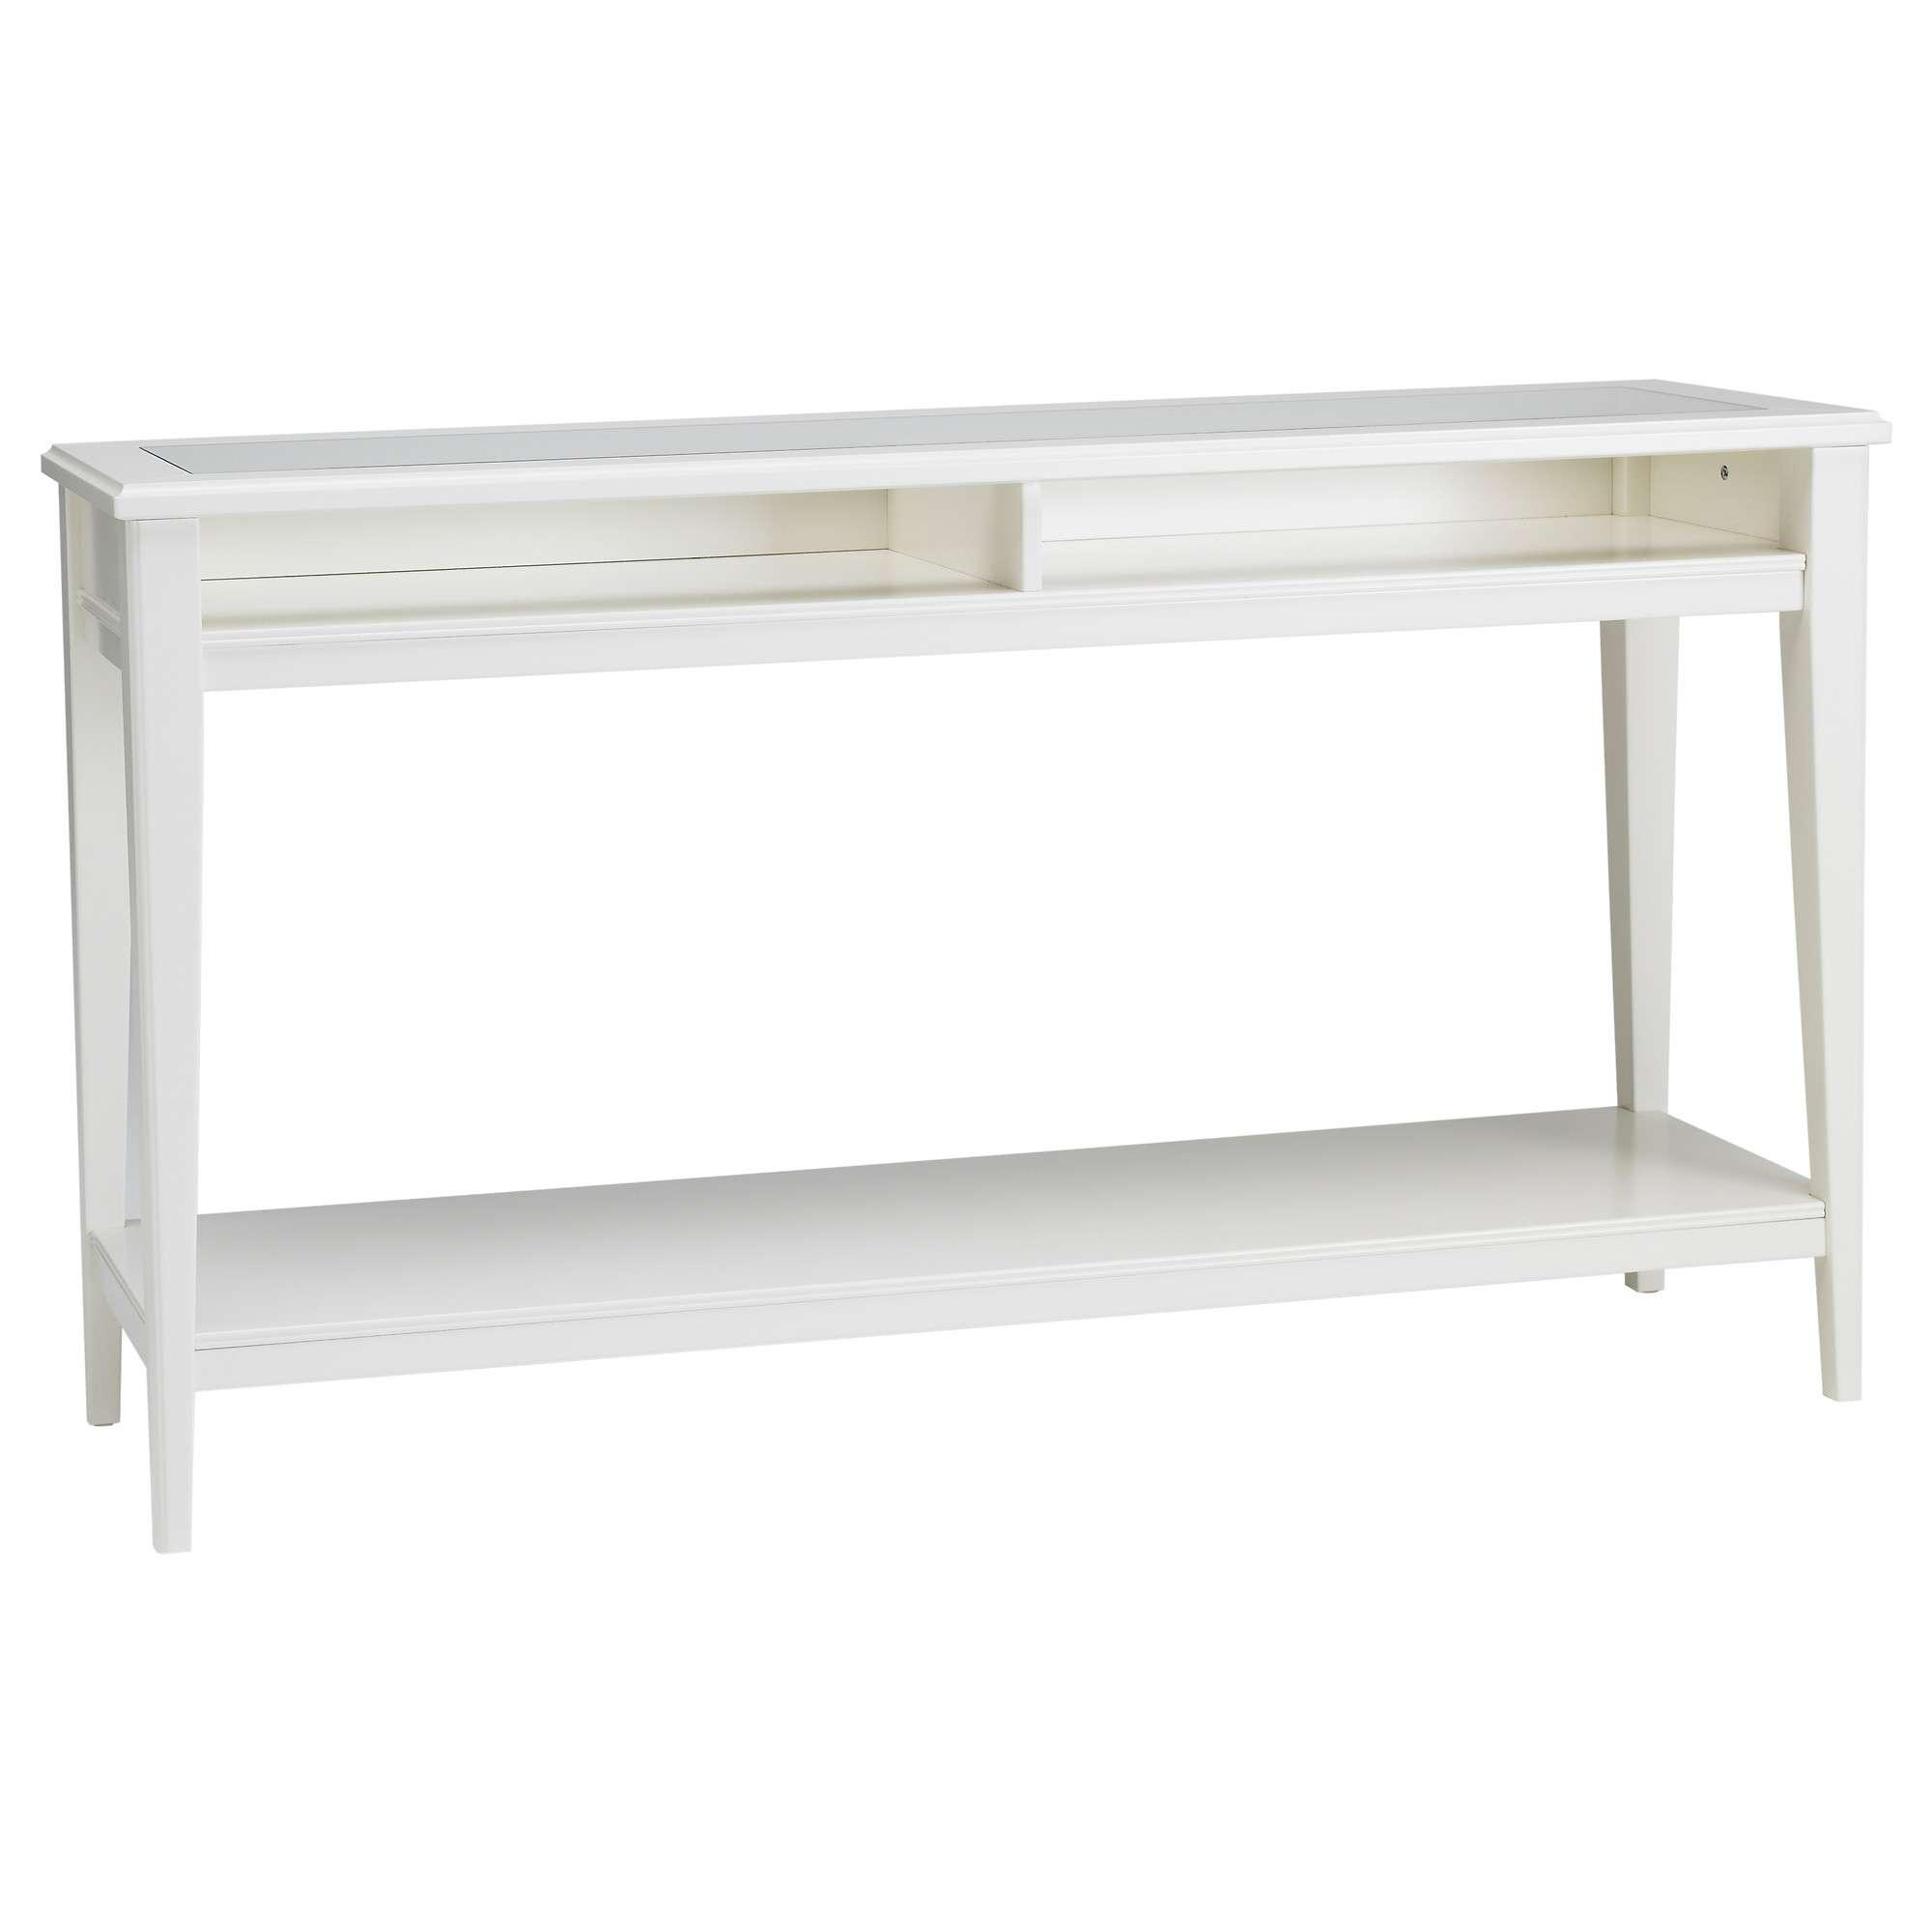 liatorp sofa table instructions kennedy bett 20 photos ikea sideboards